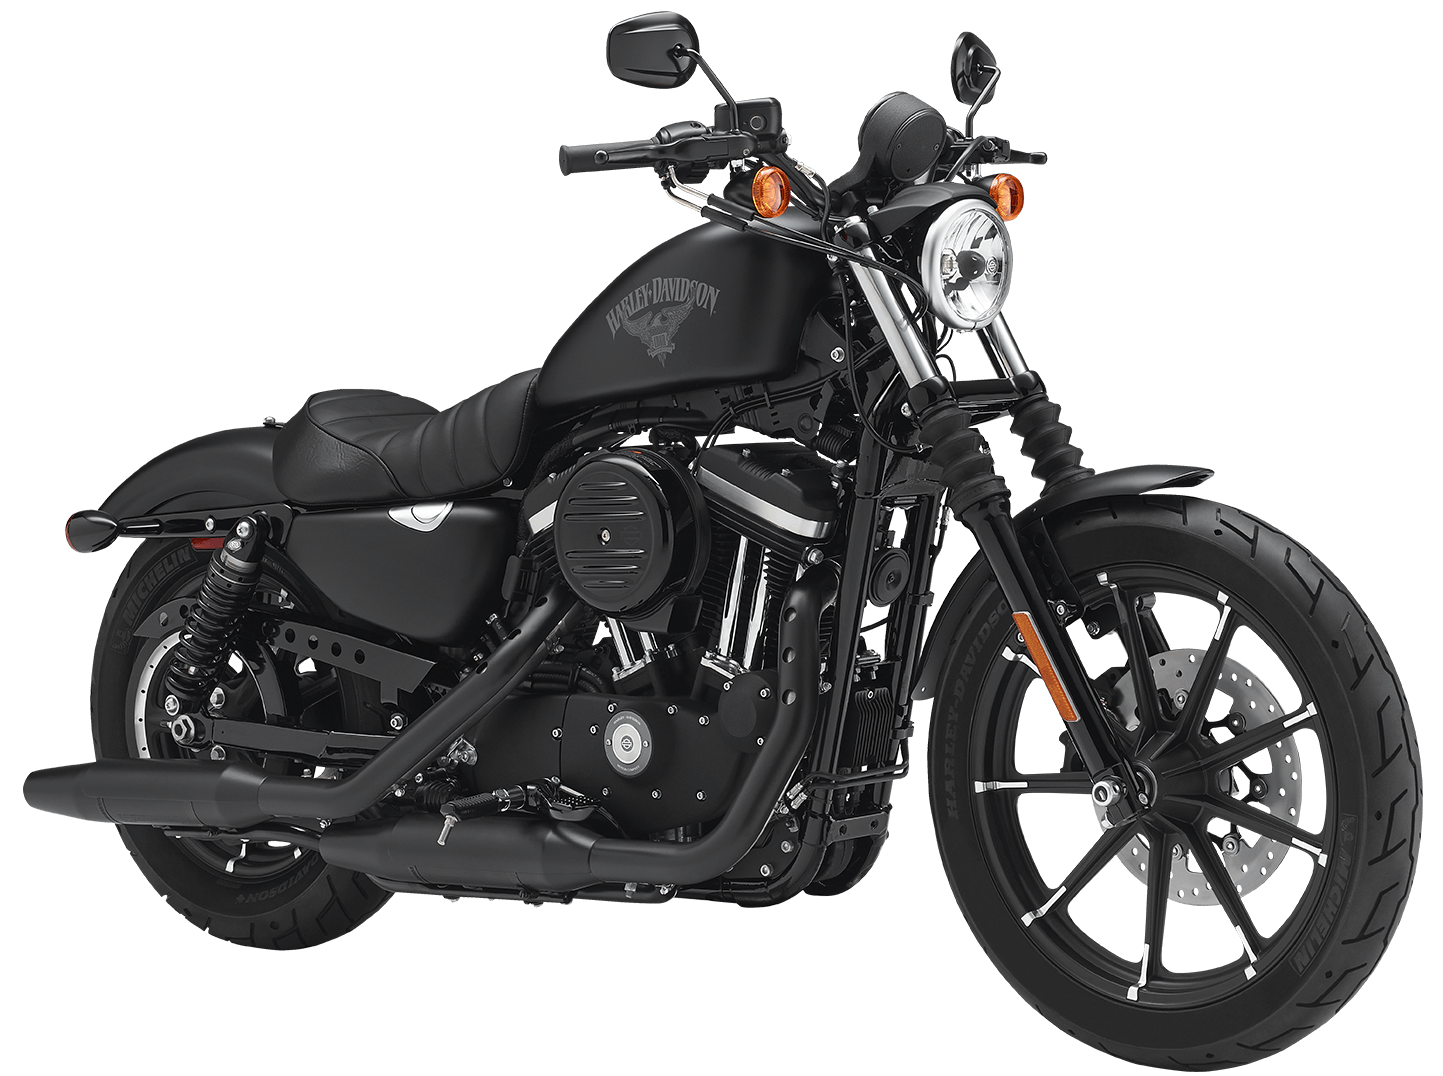 Harley Davidson Iron 883 Harley Davidson Sportster 883 Harley Davidson 883 Harley Davidson Iron 883